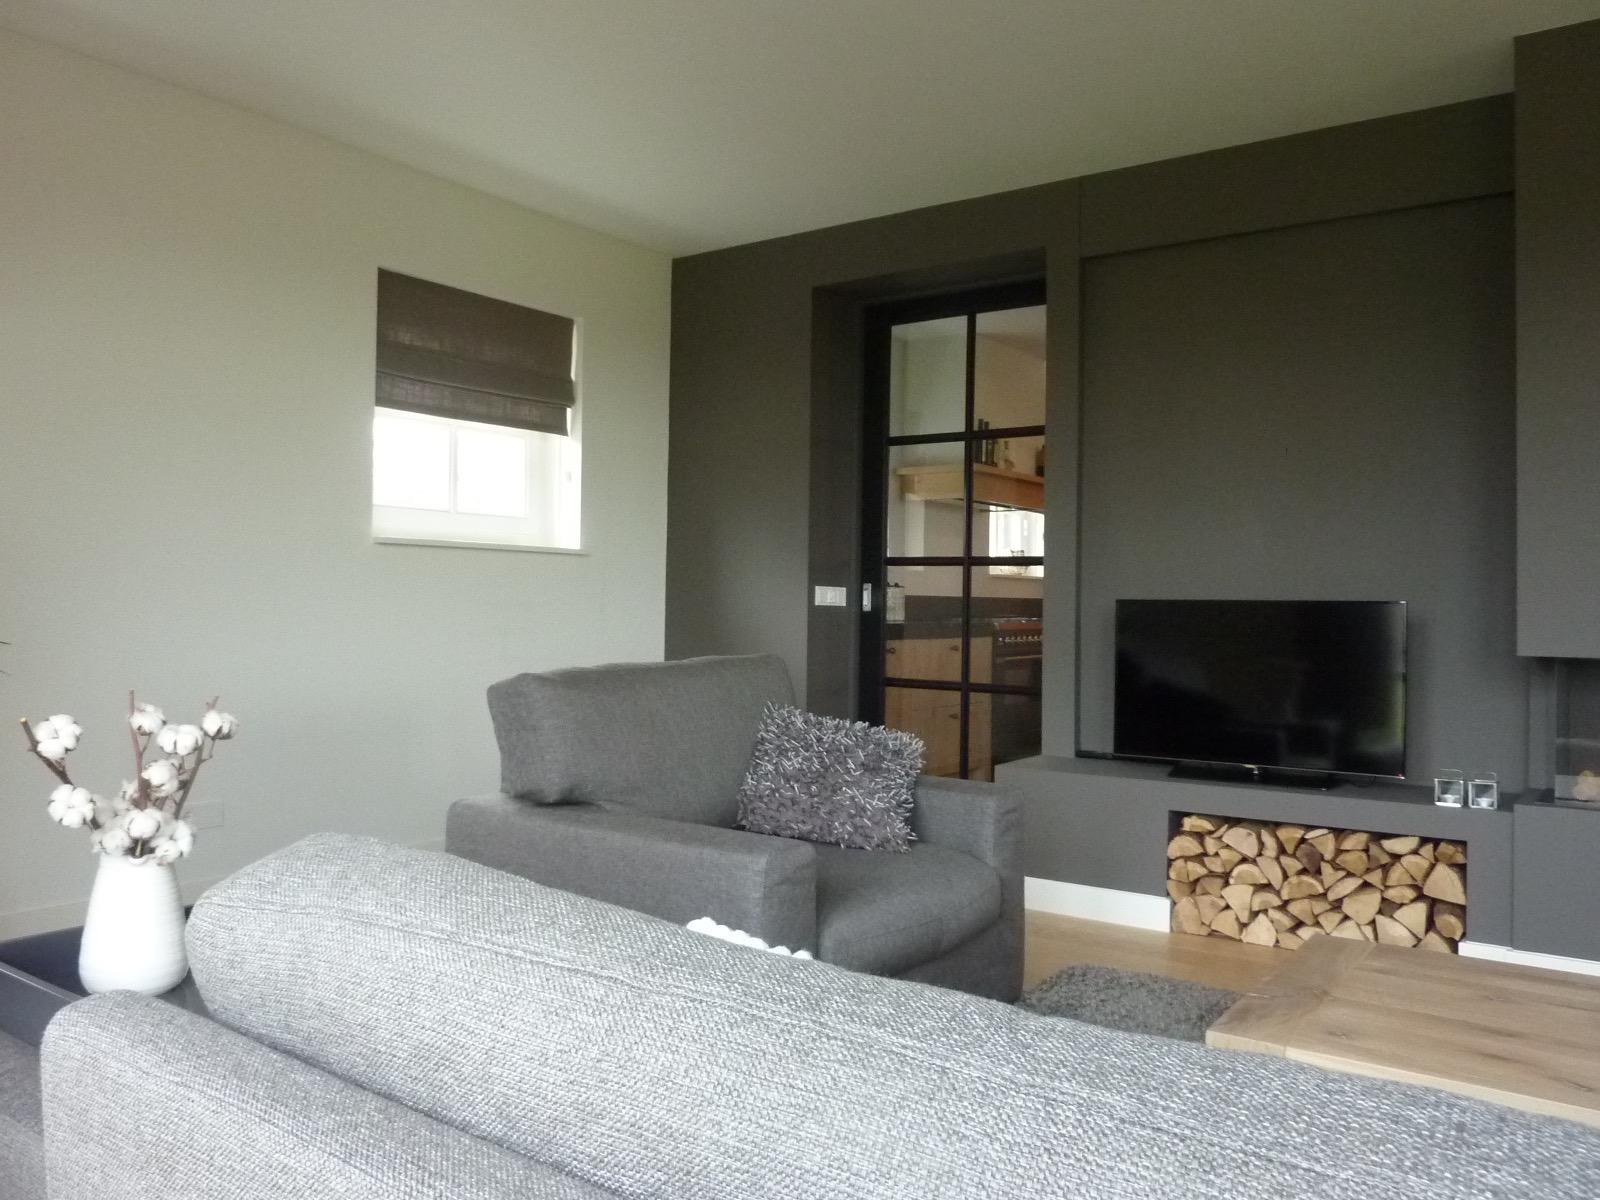 Landelijke woonkamer m style for Woonkamer style